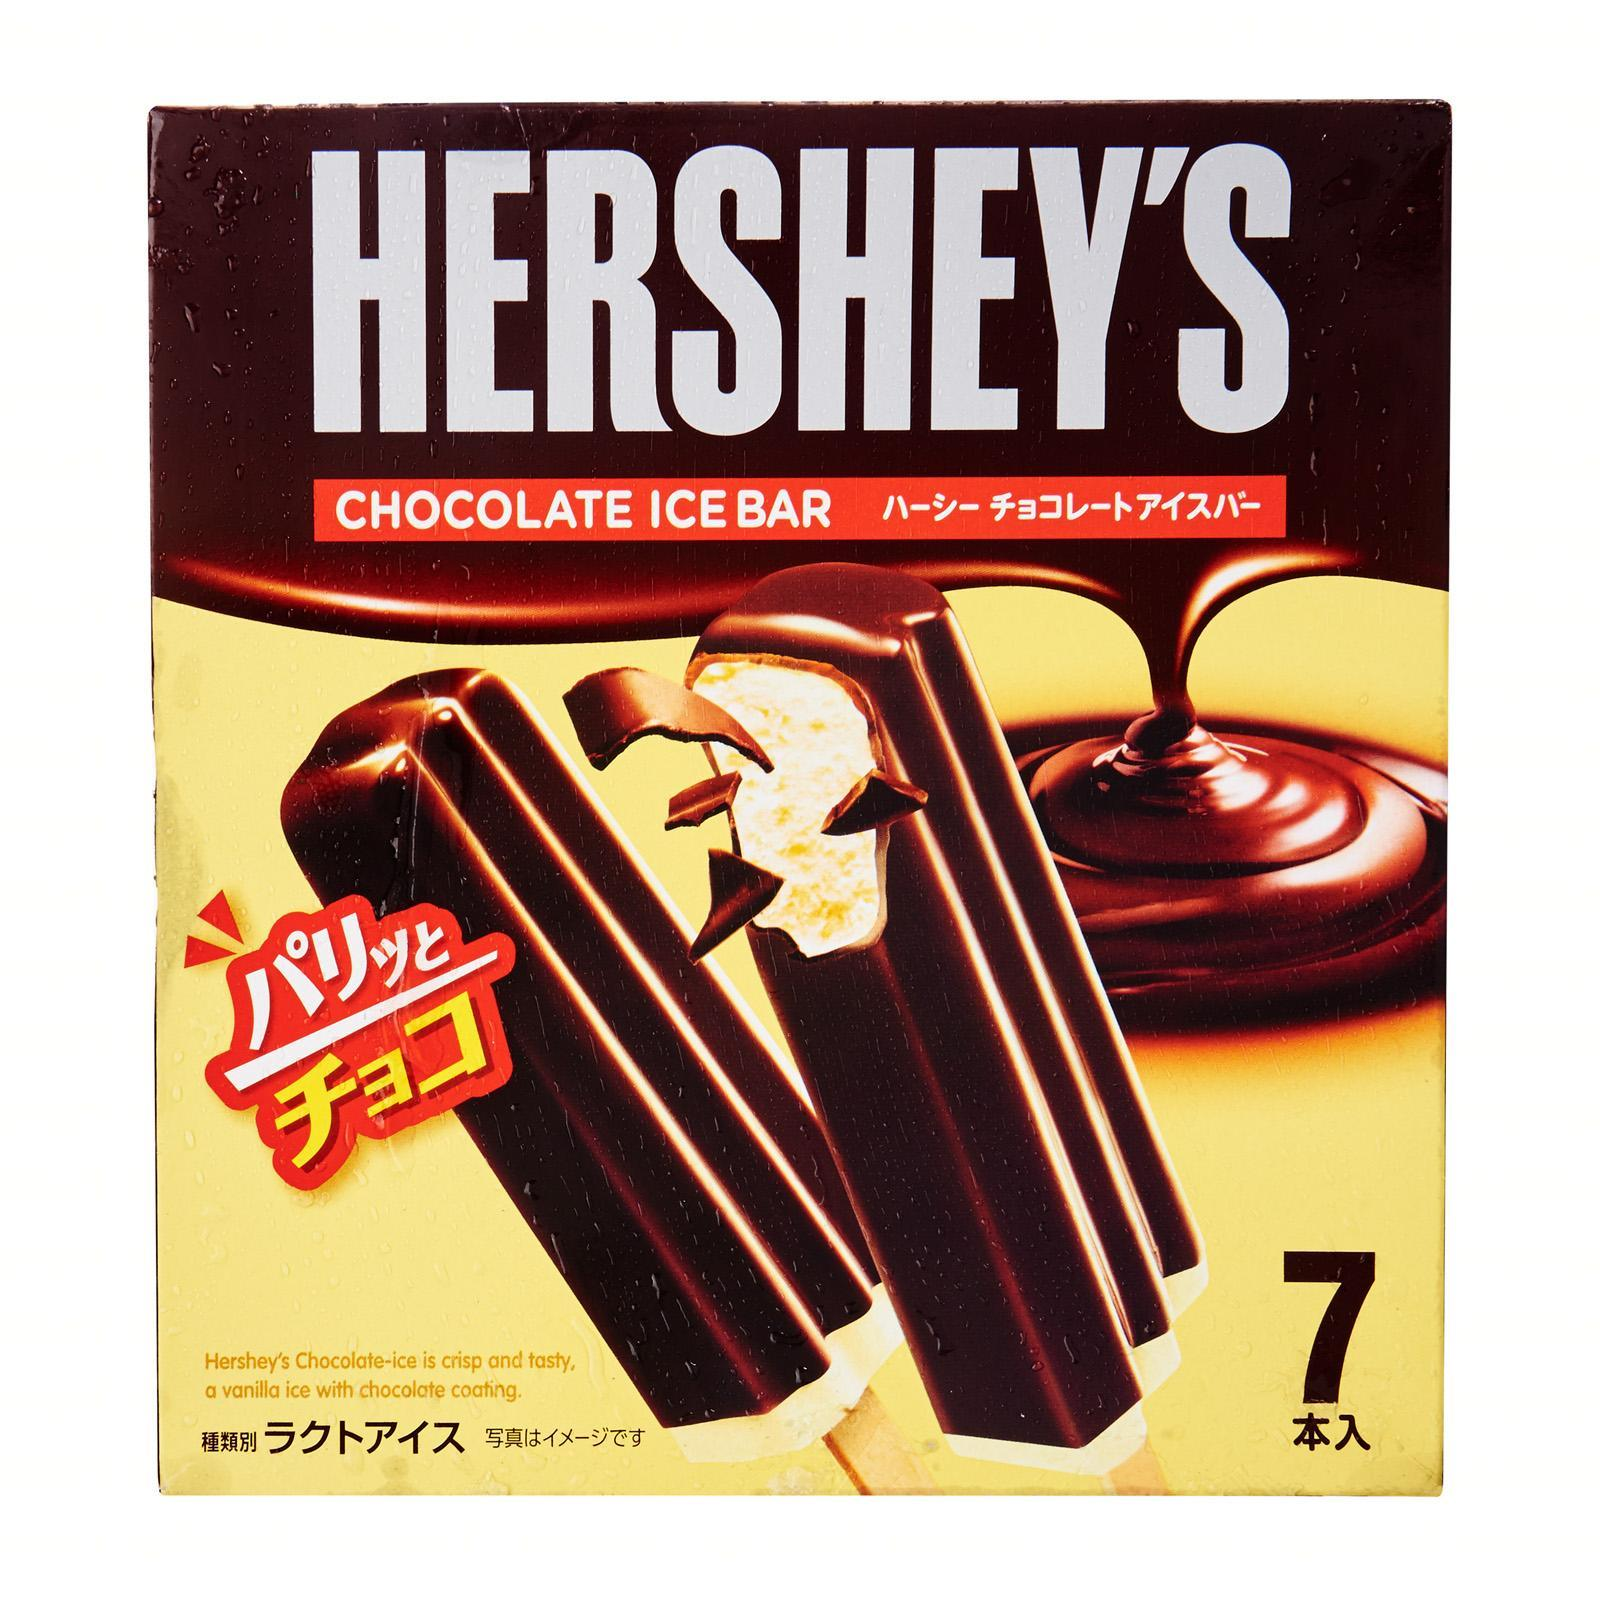 Lotte Hershey's Chocolate Ice Bar - Frozen